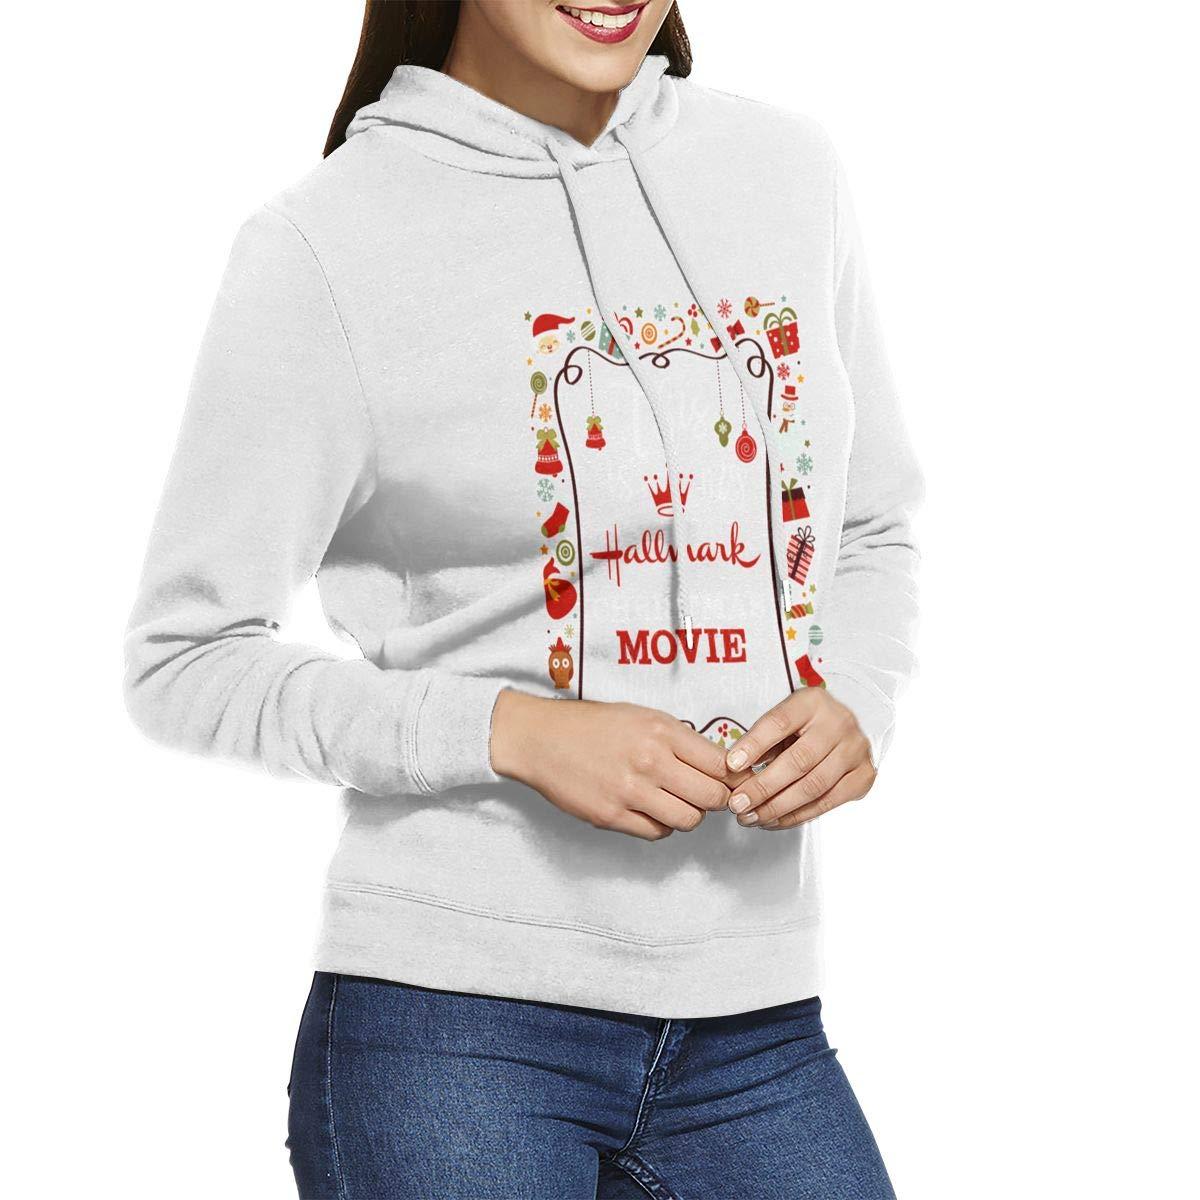 This is My Hallmark Christmas Movie Shirt Womens Hoodie Jacket Pullover